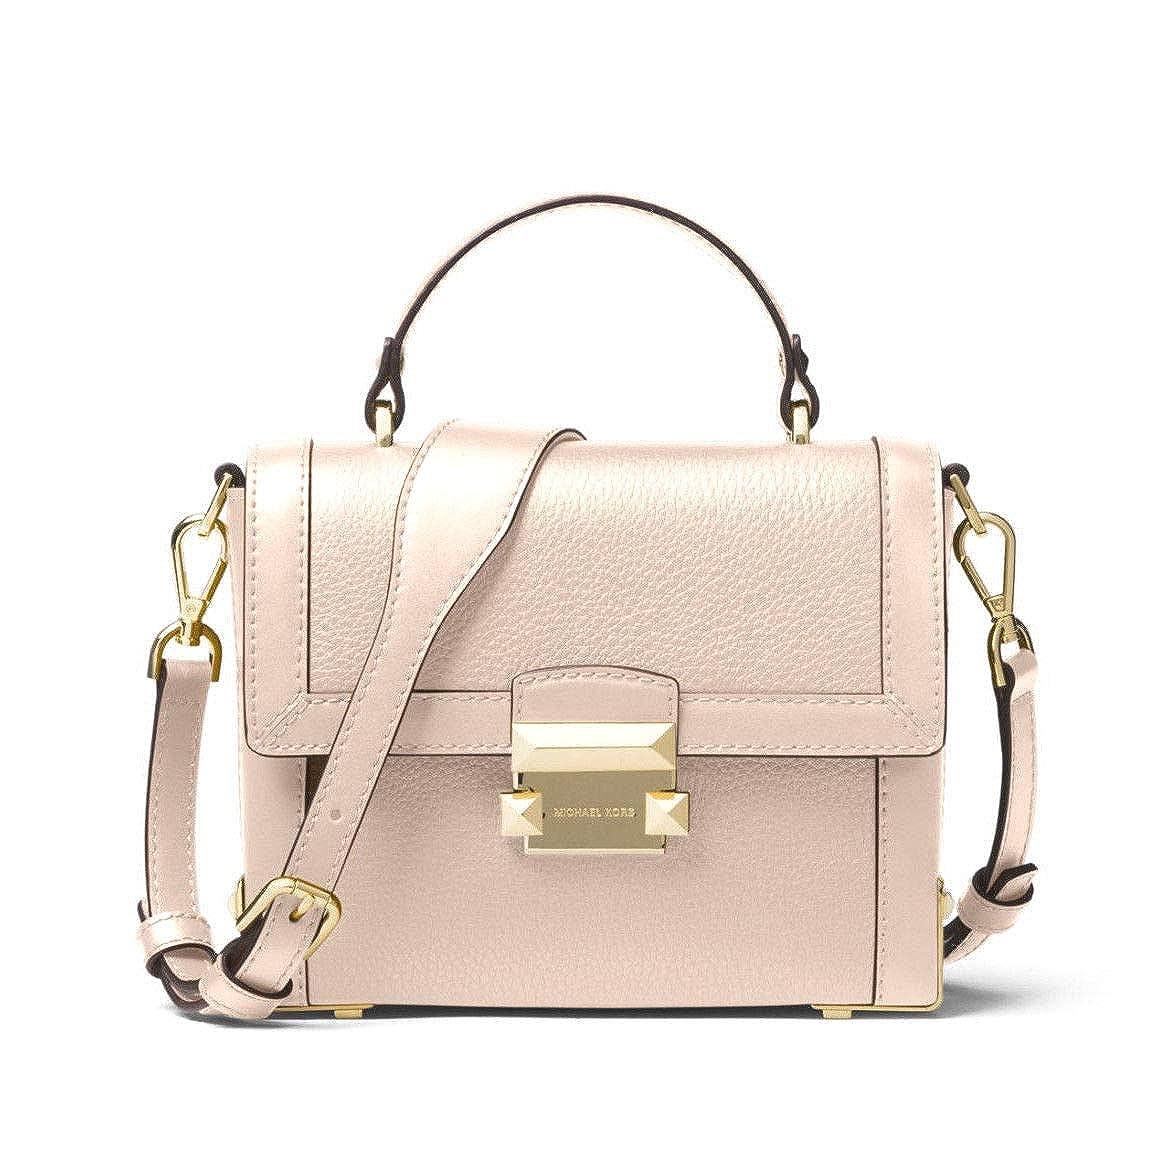 f7c96150c0b9 MICHAEL Michael Kors Jayne Small Pebbled Leather Trunk Bag in Soft Pink   Handbags  Amazon.com